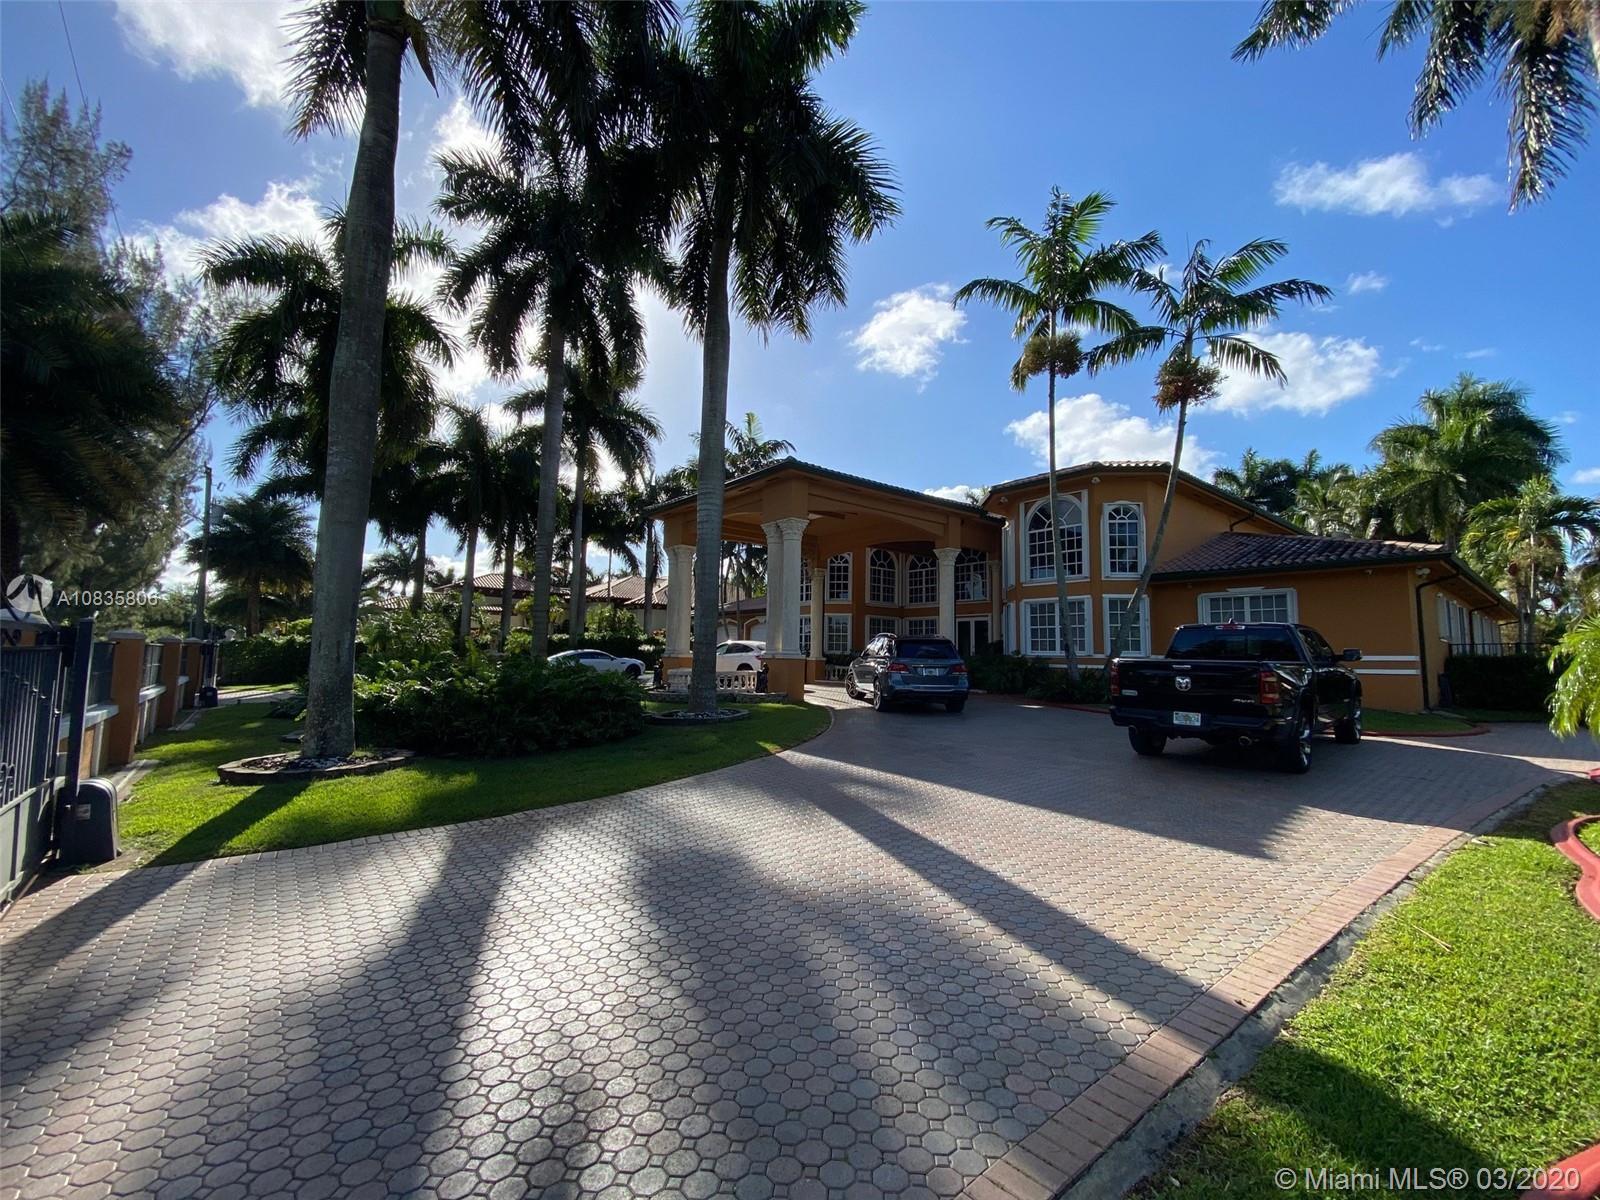 9928 NW 133rd St, Hialeah Gardens, FL 33018